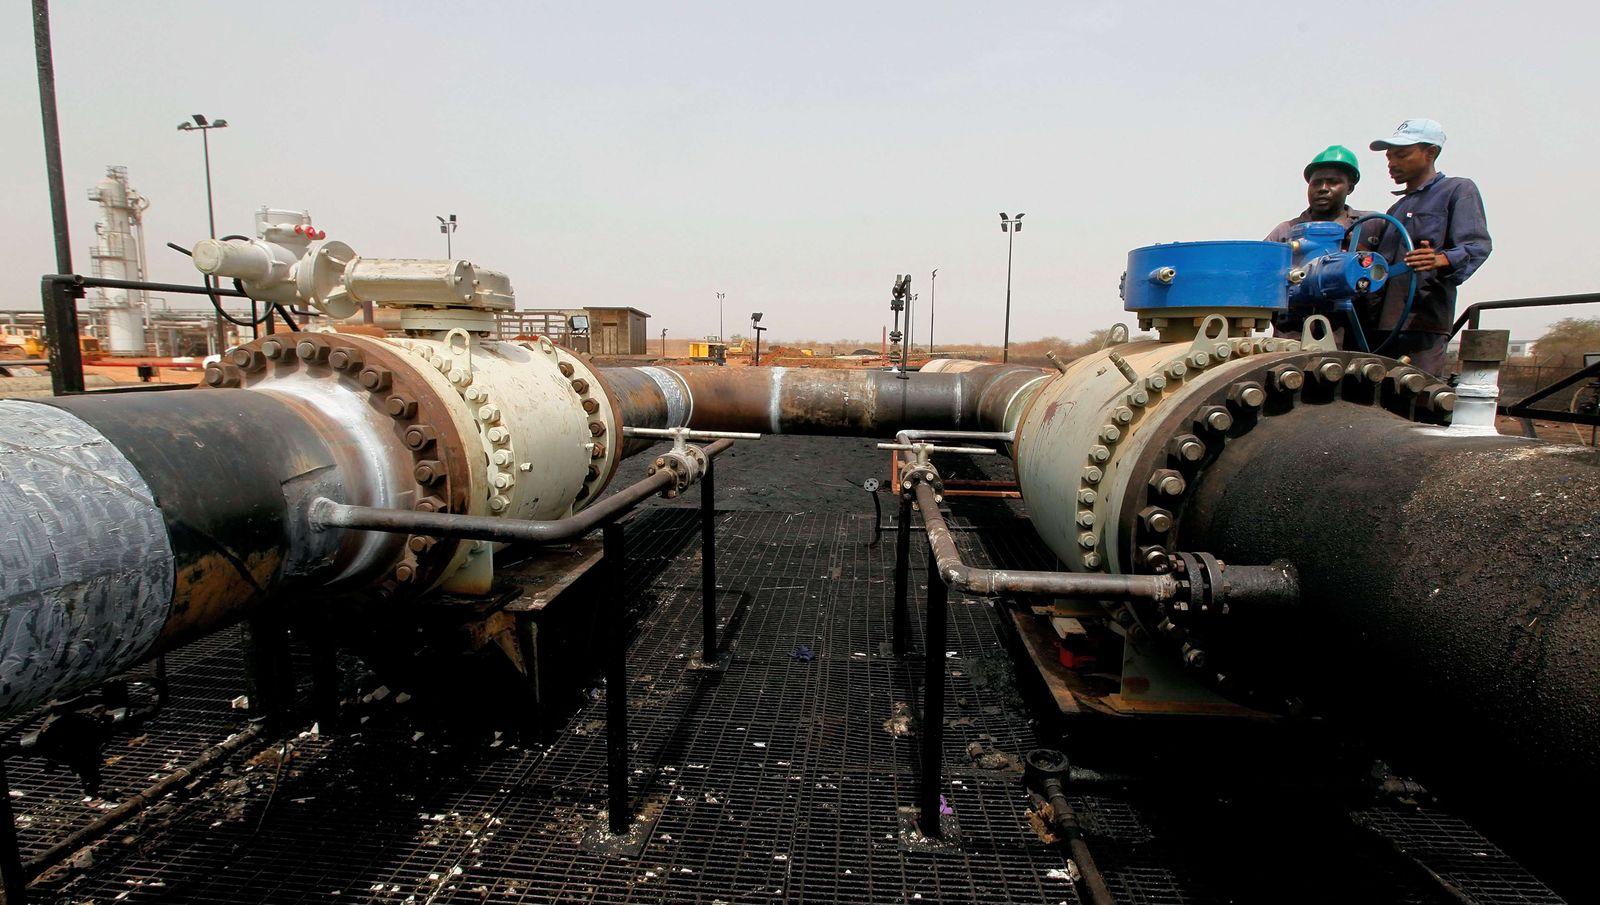 CORRECTION-SUDAN-SSUDAN-UNREST-ECNOMY-OIL